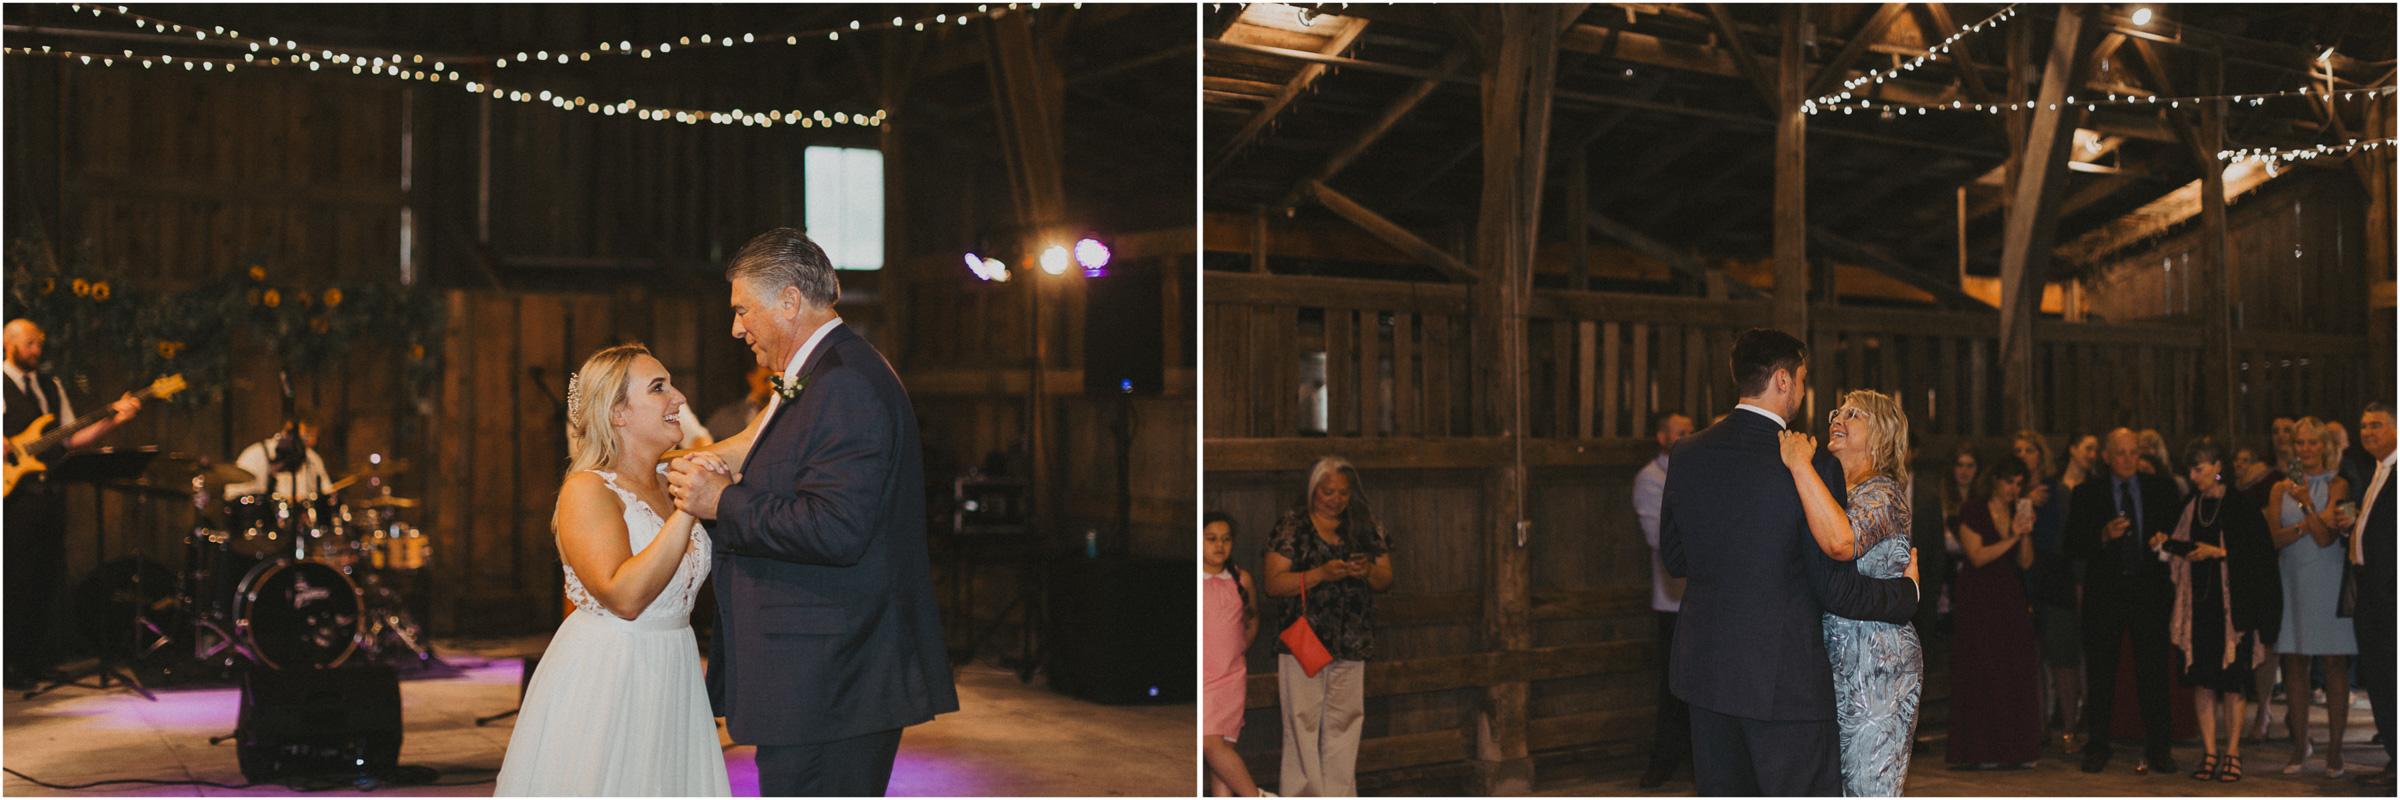 alyssa barletter photography nelson wedding nebraska city lied lodge morton barn spring wedding photographer-60.jpg